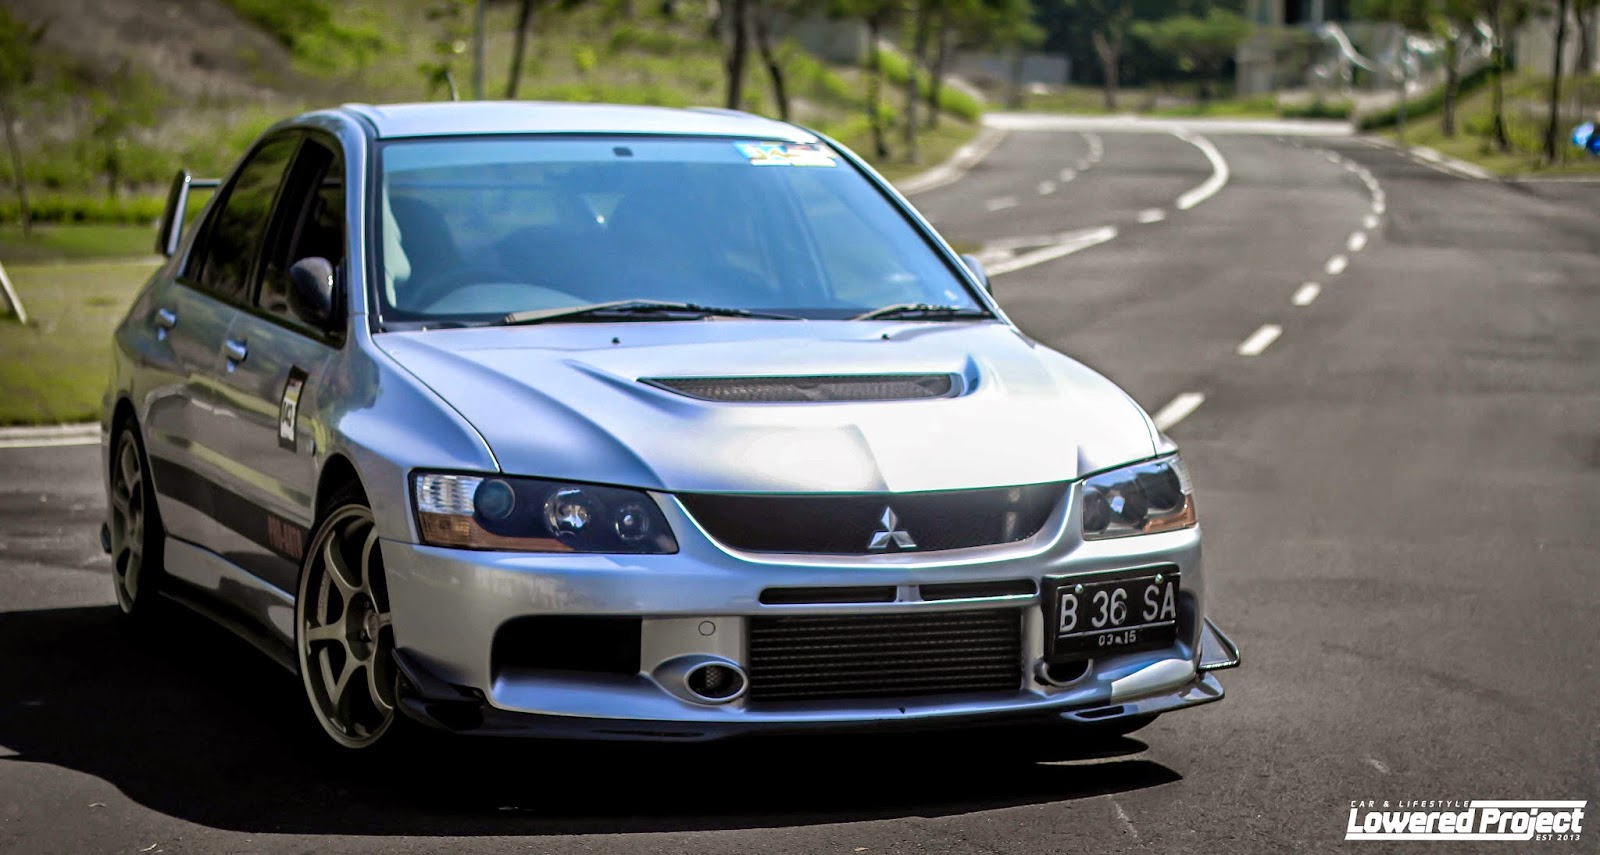 Foto Modifikasi Mobil Lancer Evo Modifikasi Style